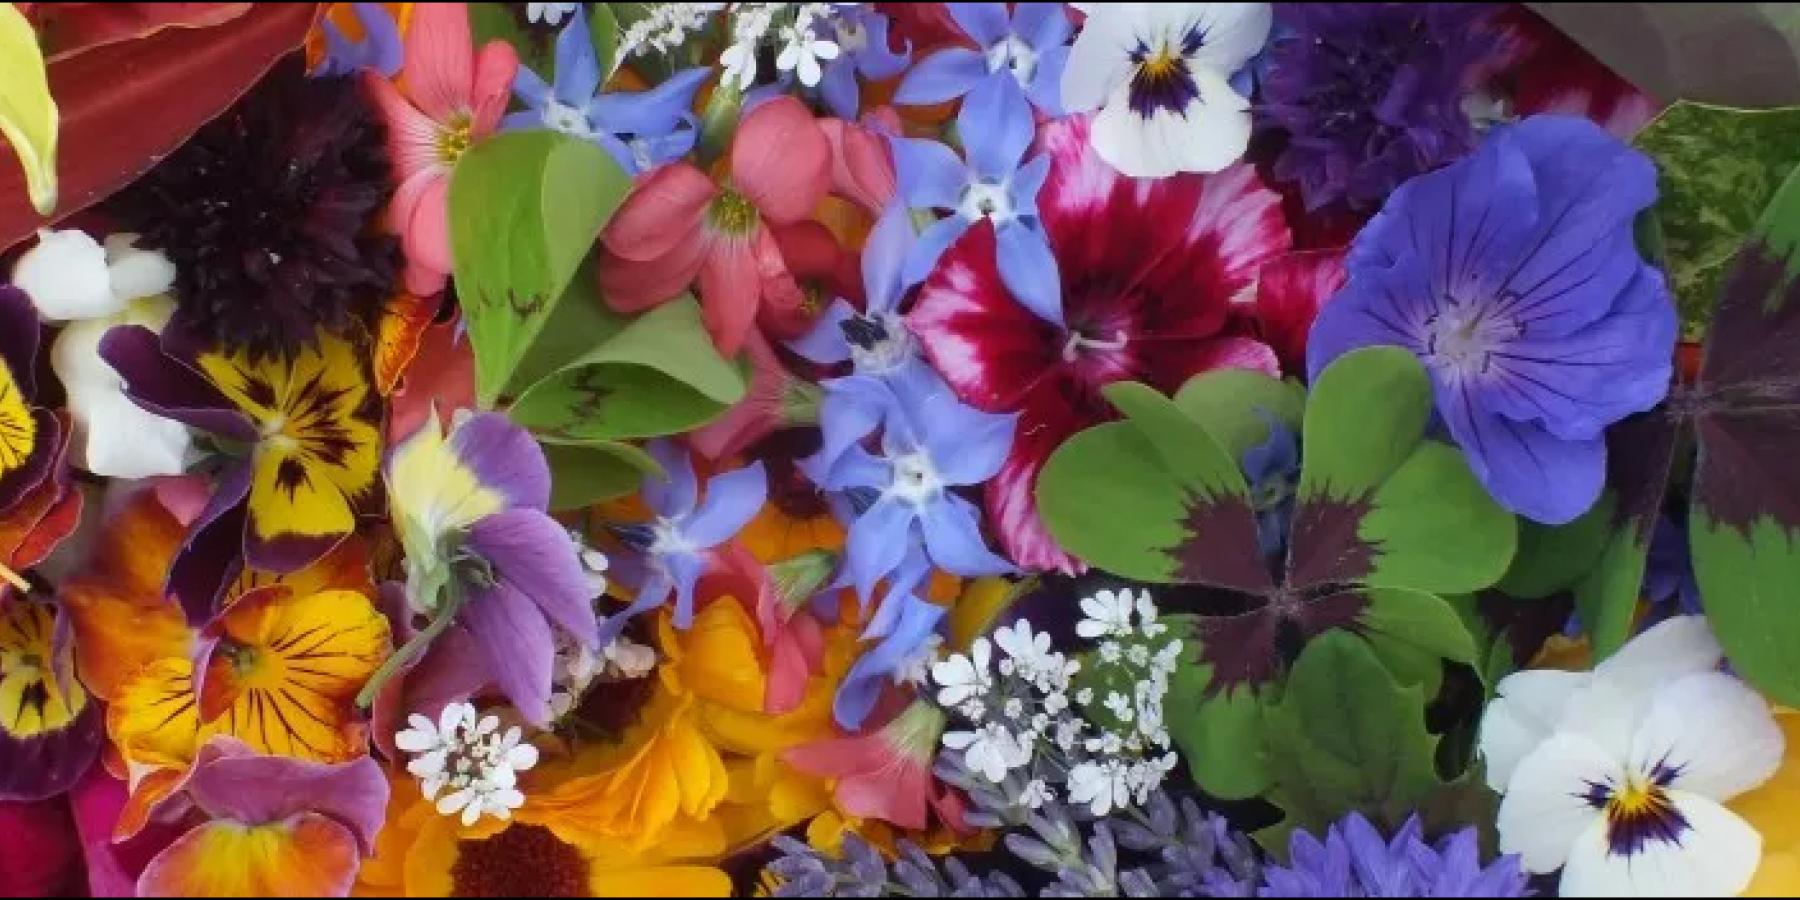 grow-edible-flowers.png